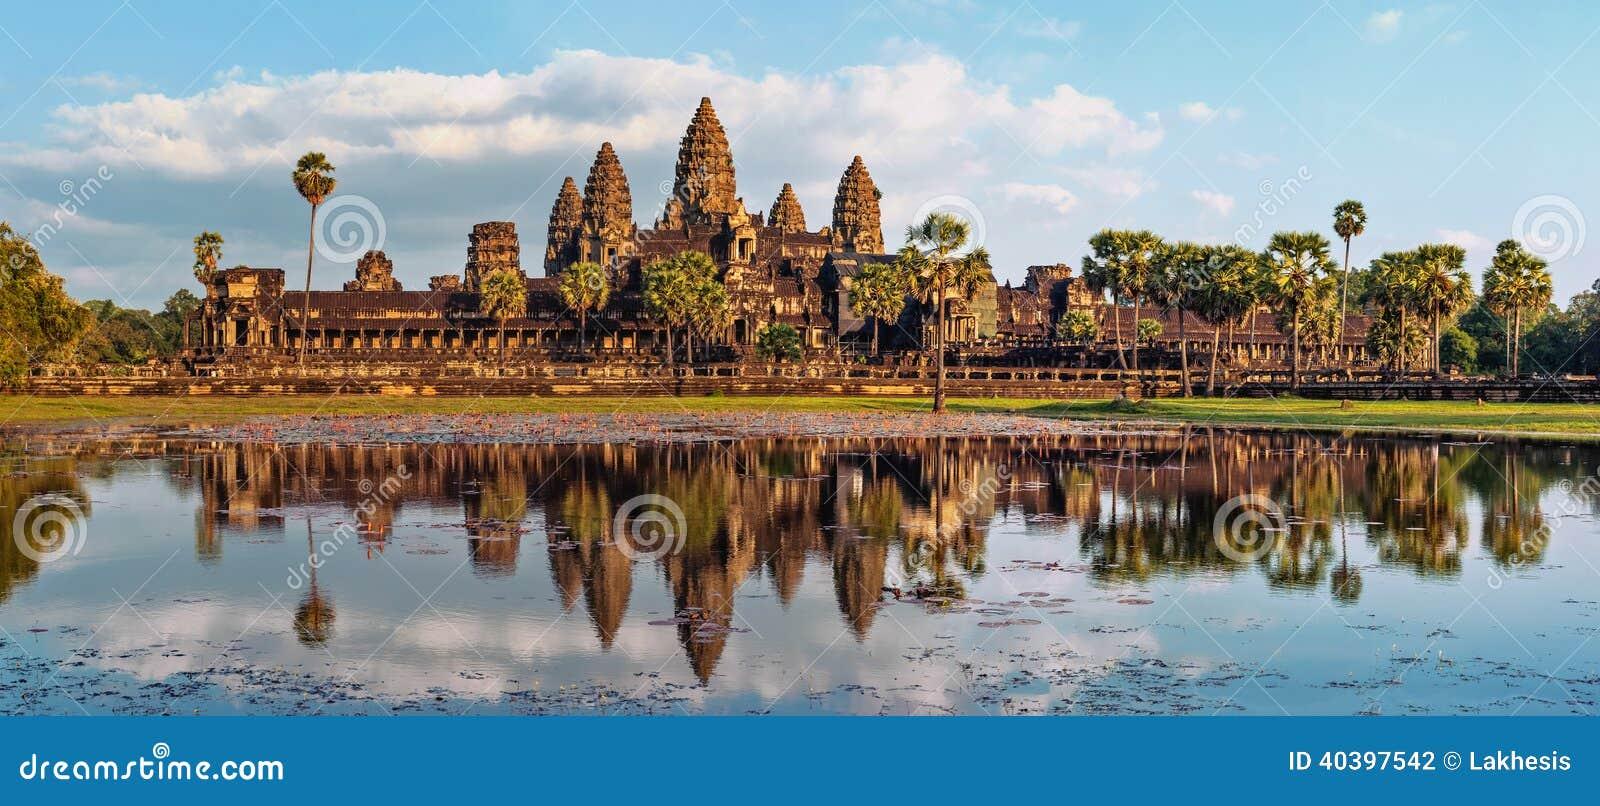 Panorama view of Angkor Wat temple. Siem Reap, Cambodia